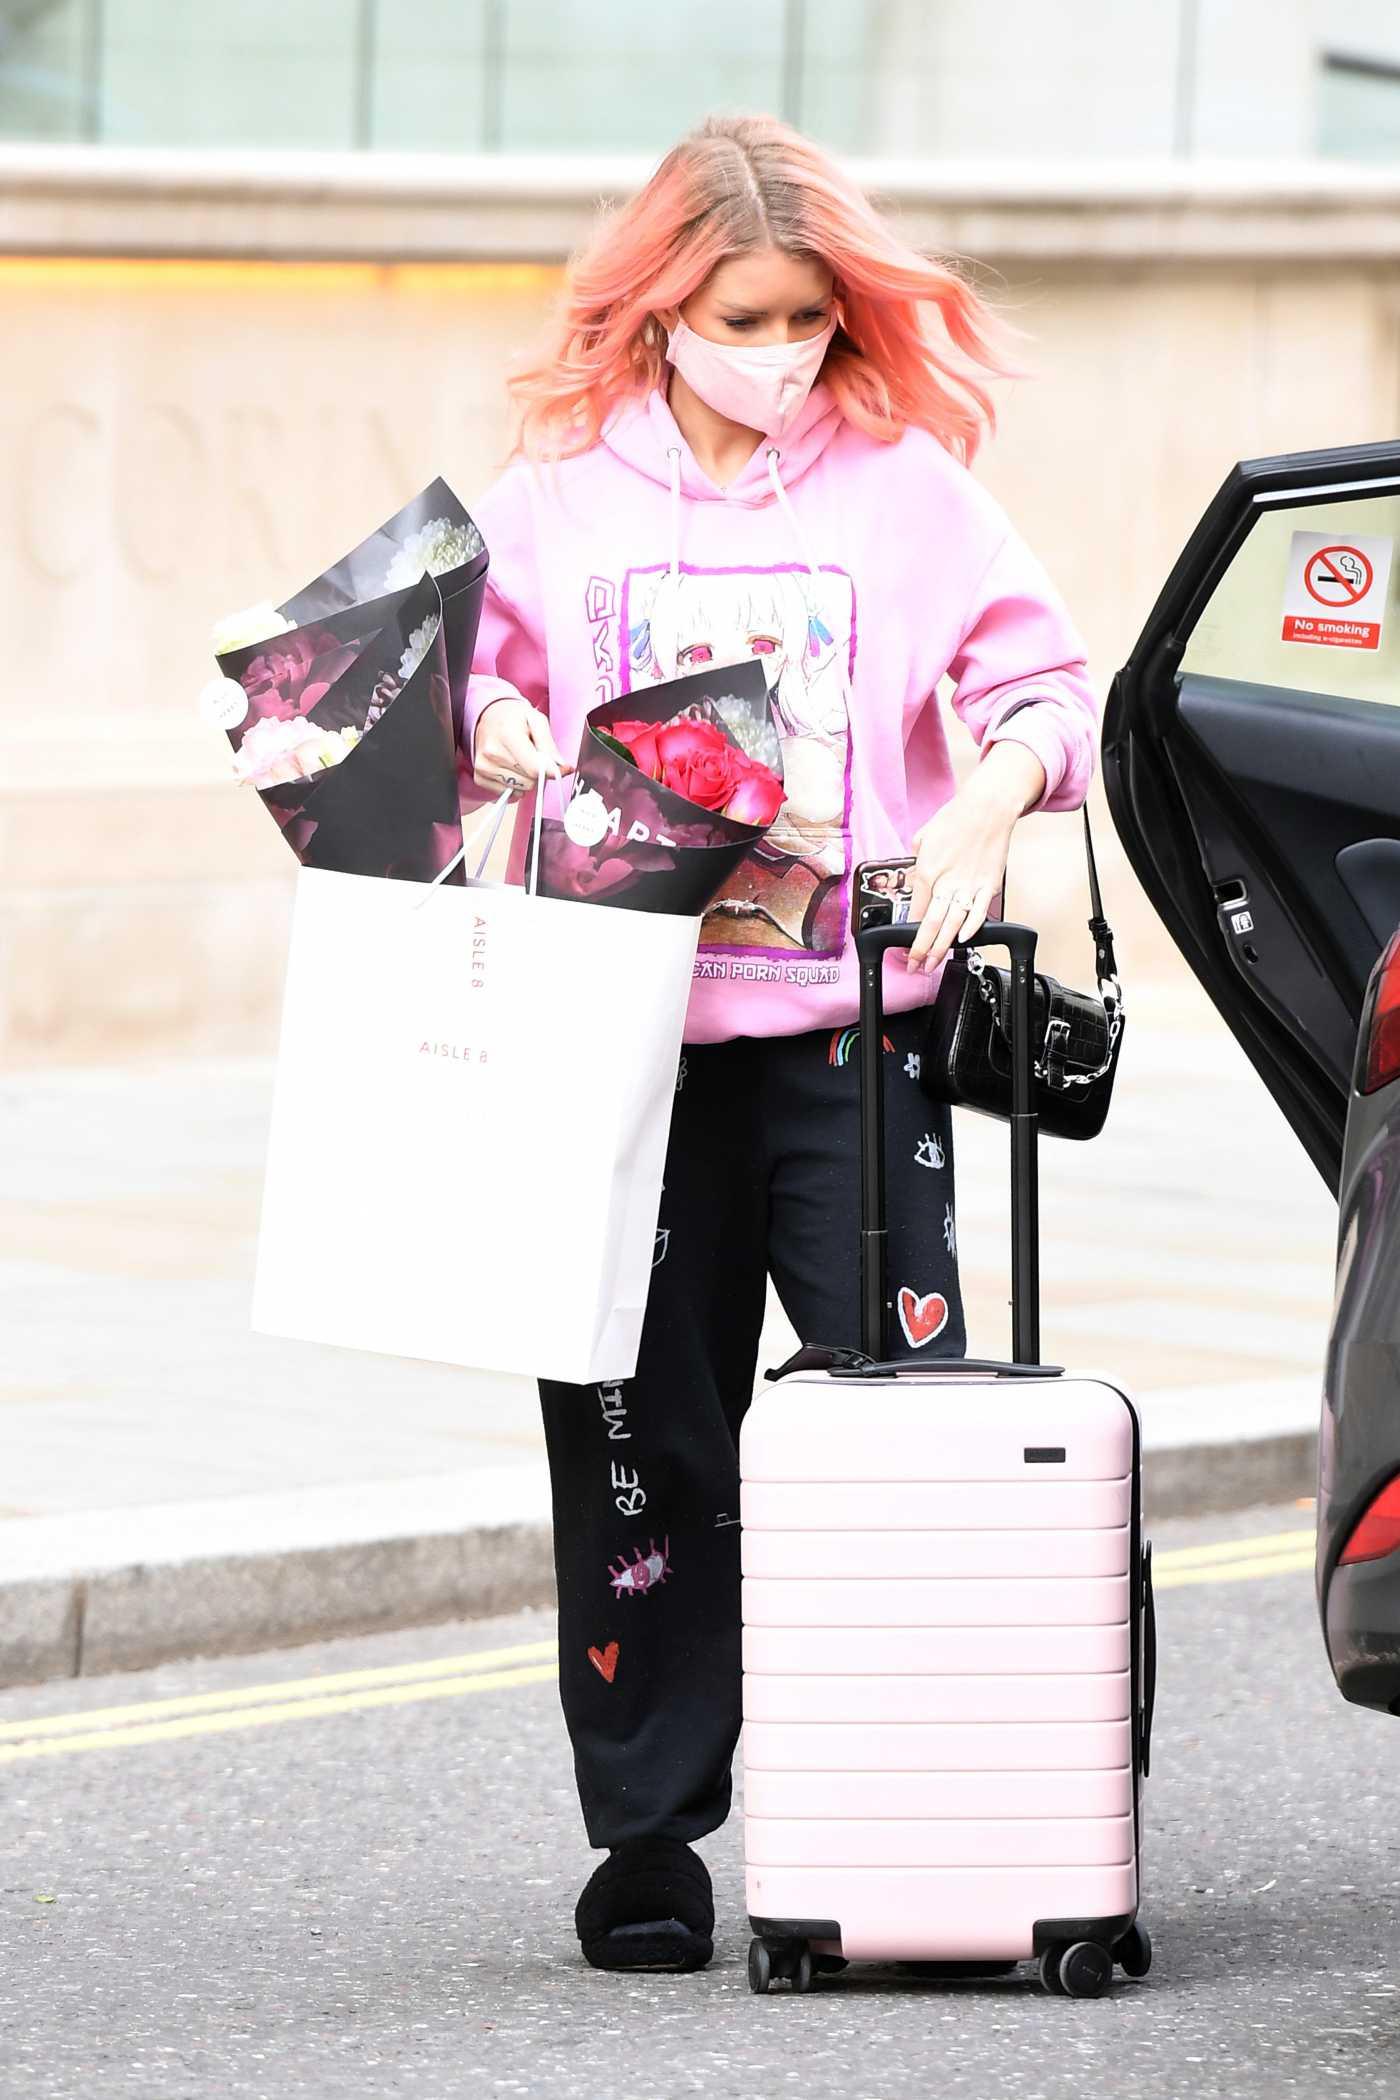 Lottie Moss in a Pink Hoodie Leaves the Corinthia Hotel in London 05/25/2021